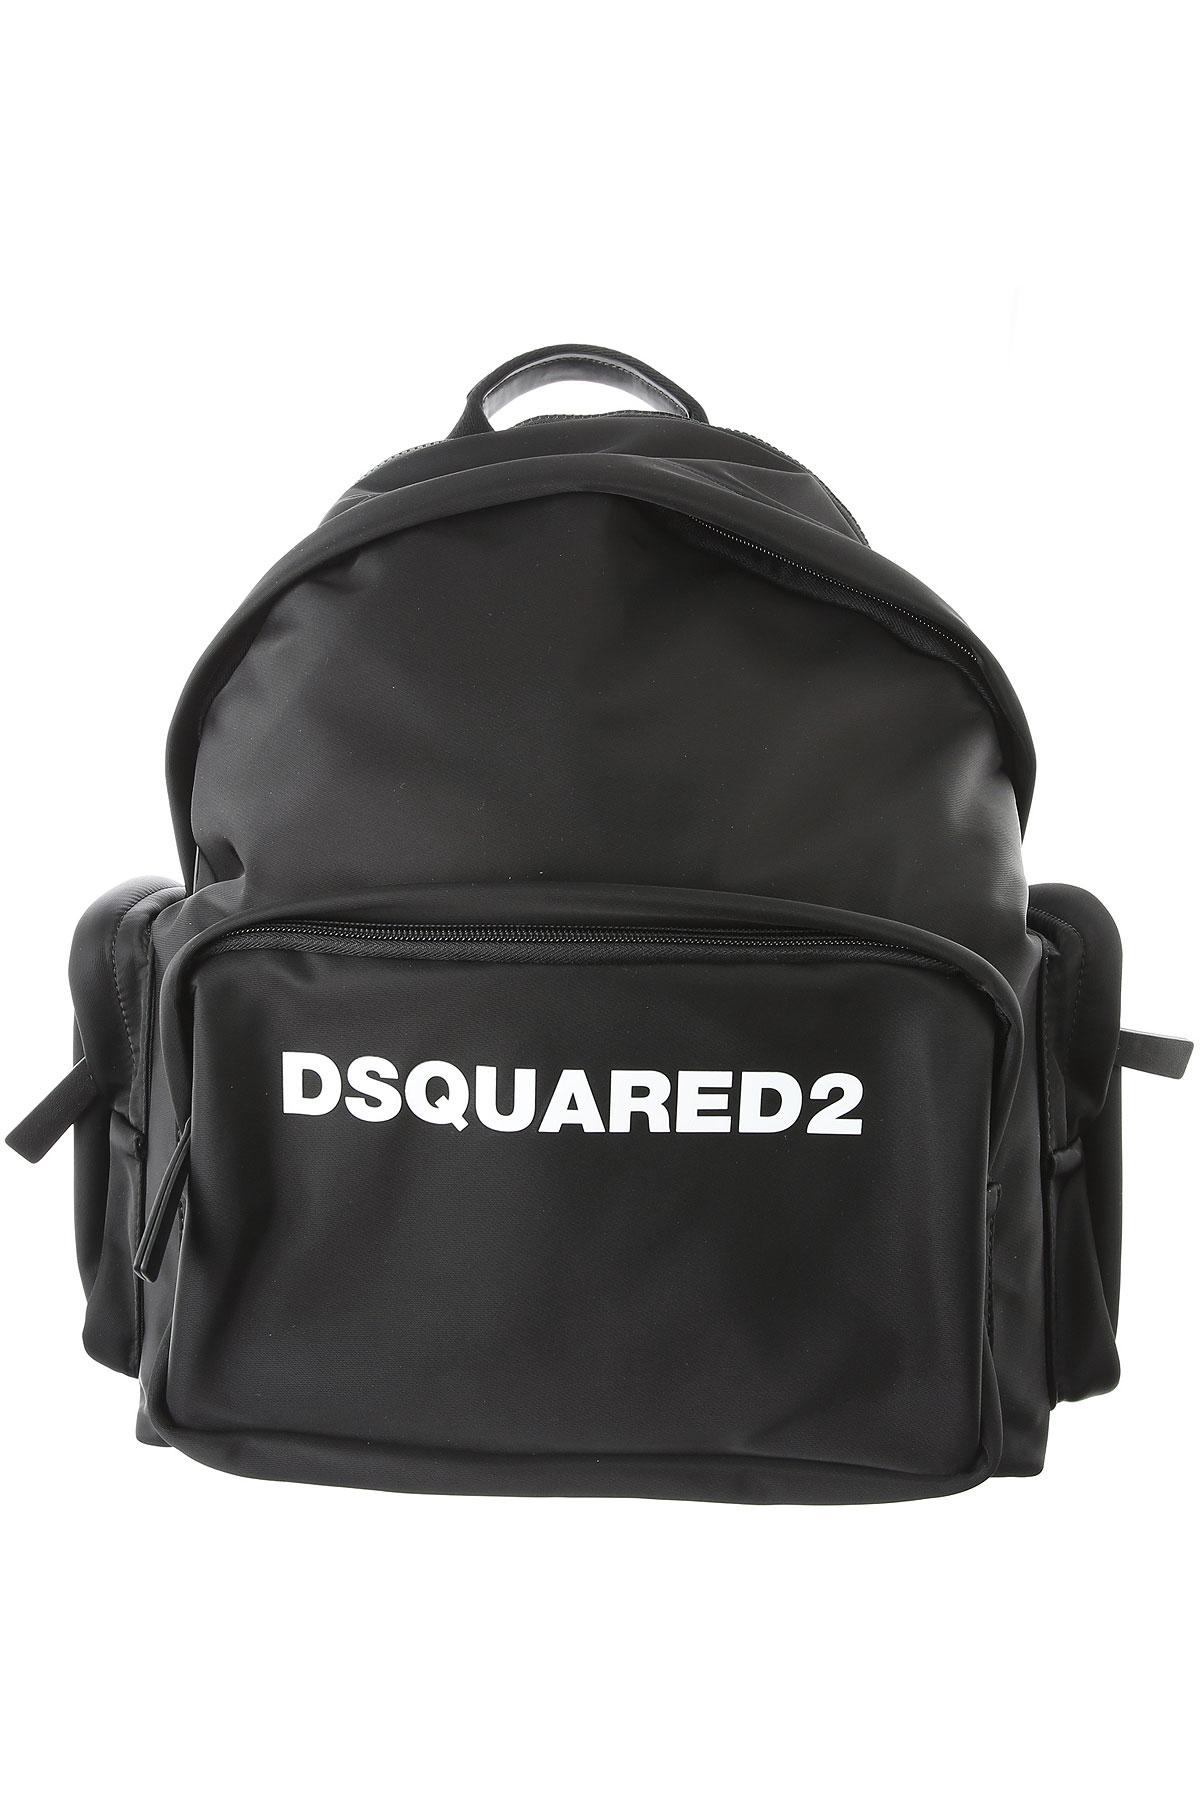 Dsquared2 Backpack for Men On Sale, Black, Fabric, 2019